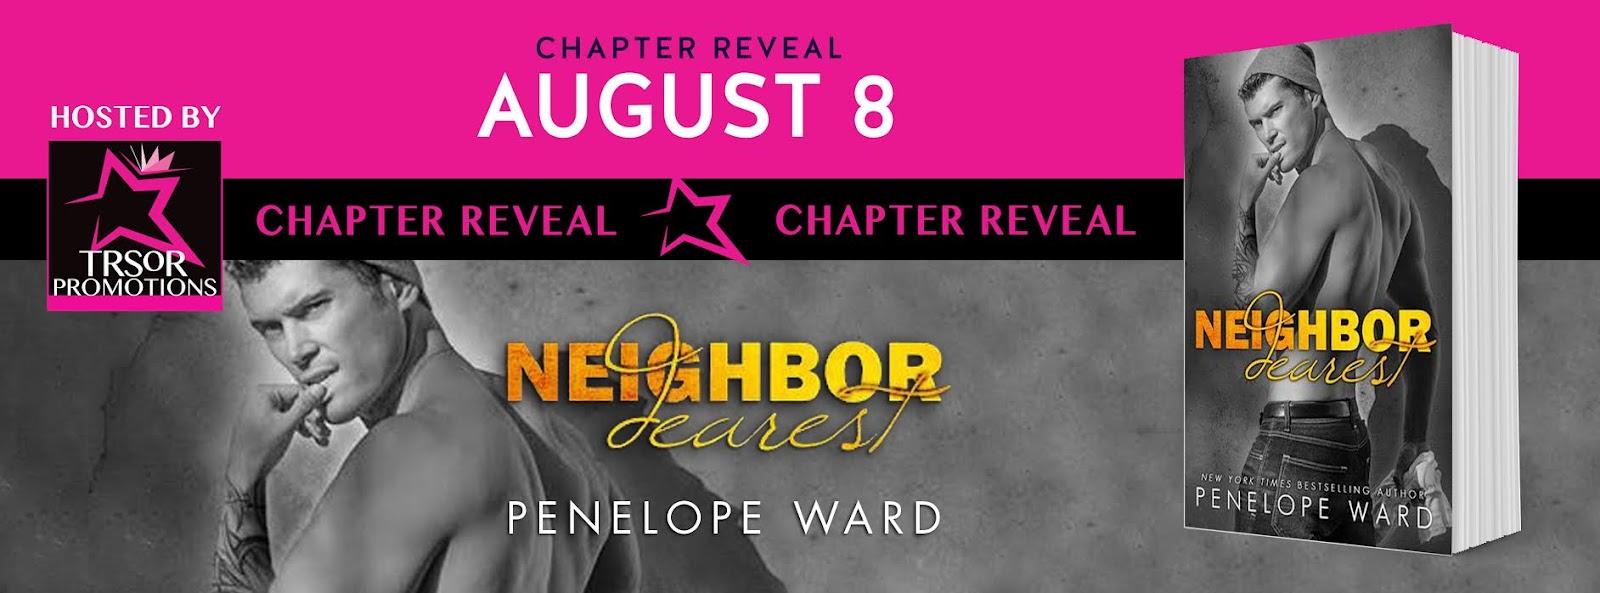 neighbor dearest chapter reveal.jpg